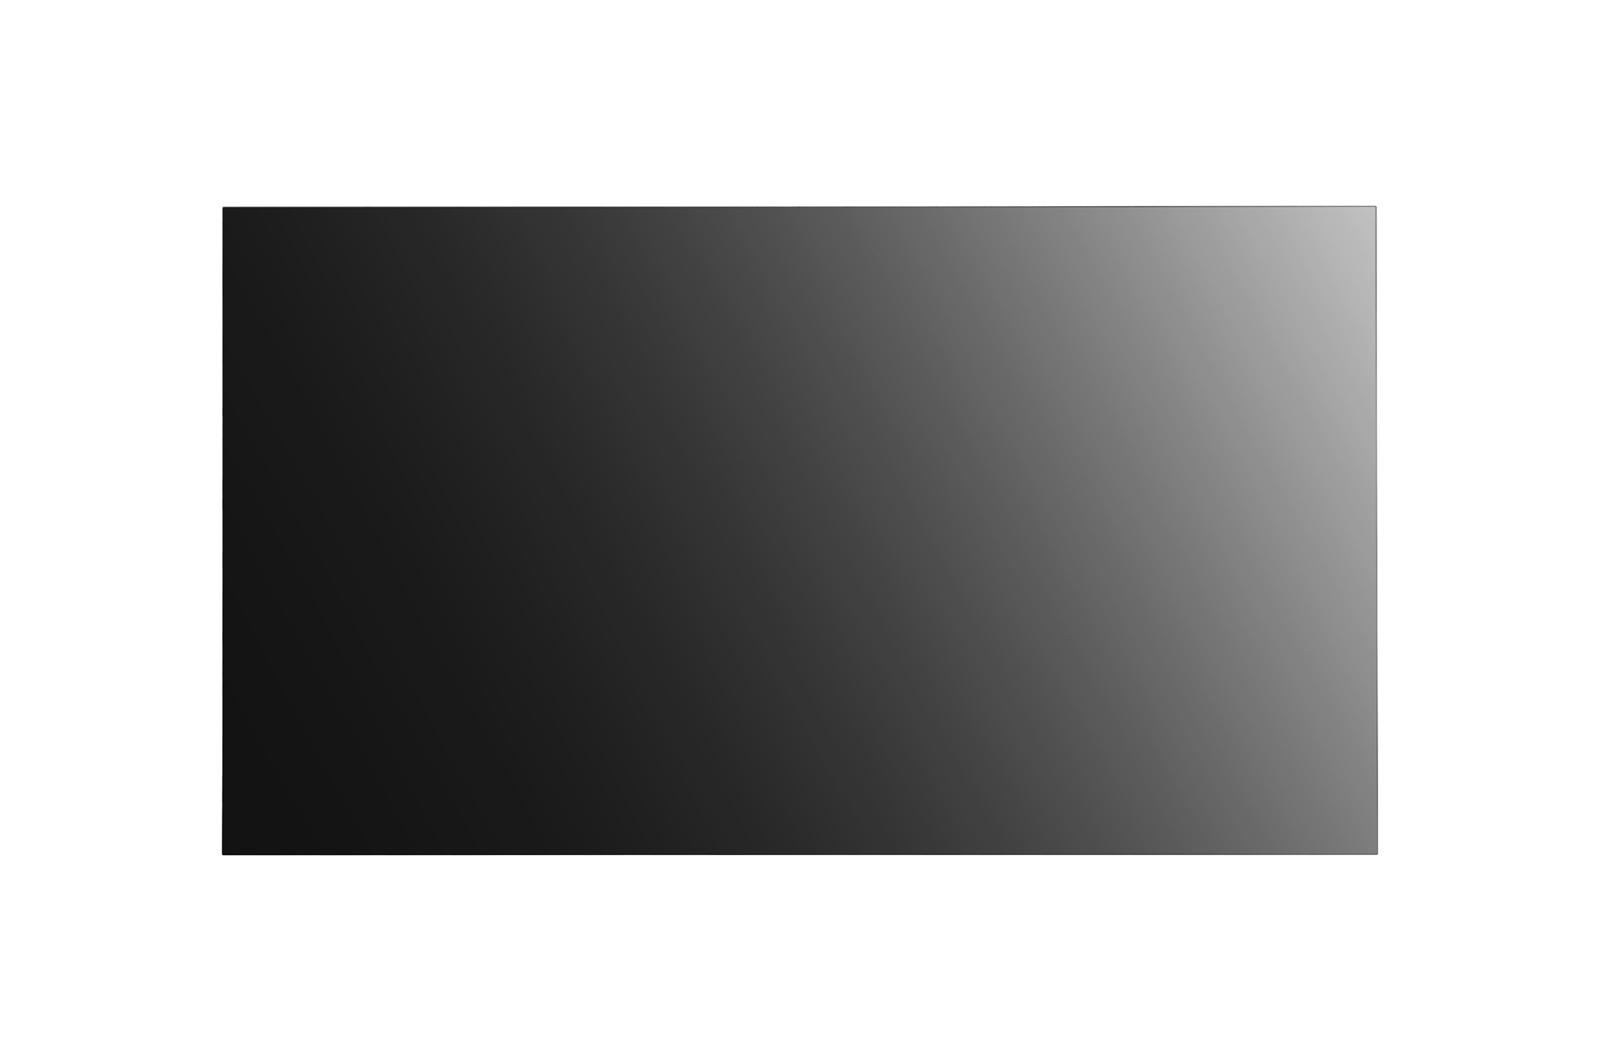 LG MONITOR 55 LED 55VM5E-A.AEU